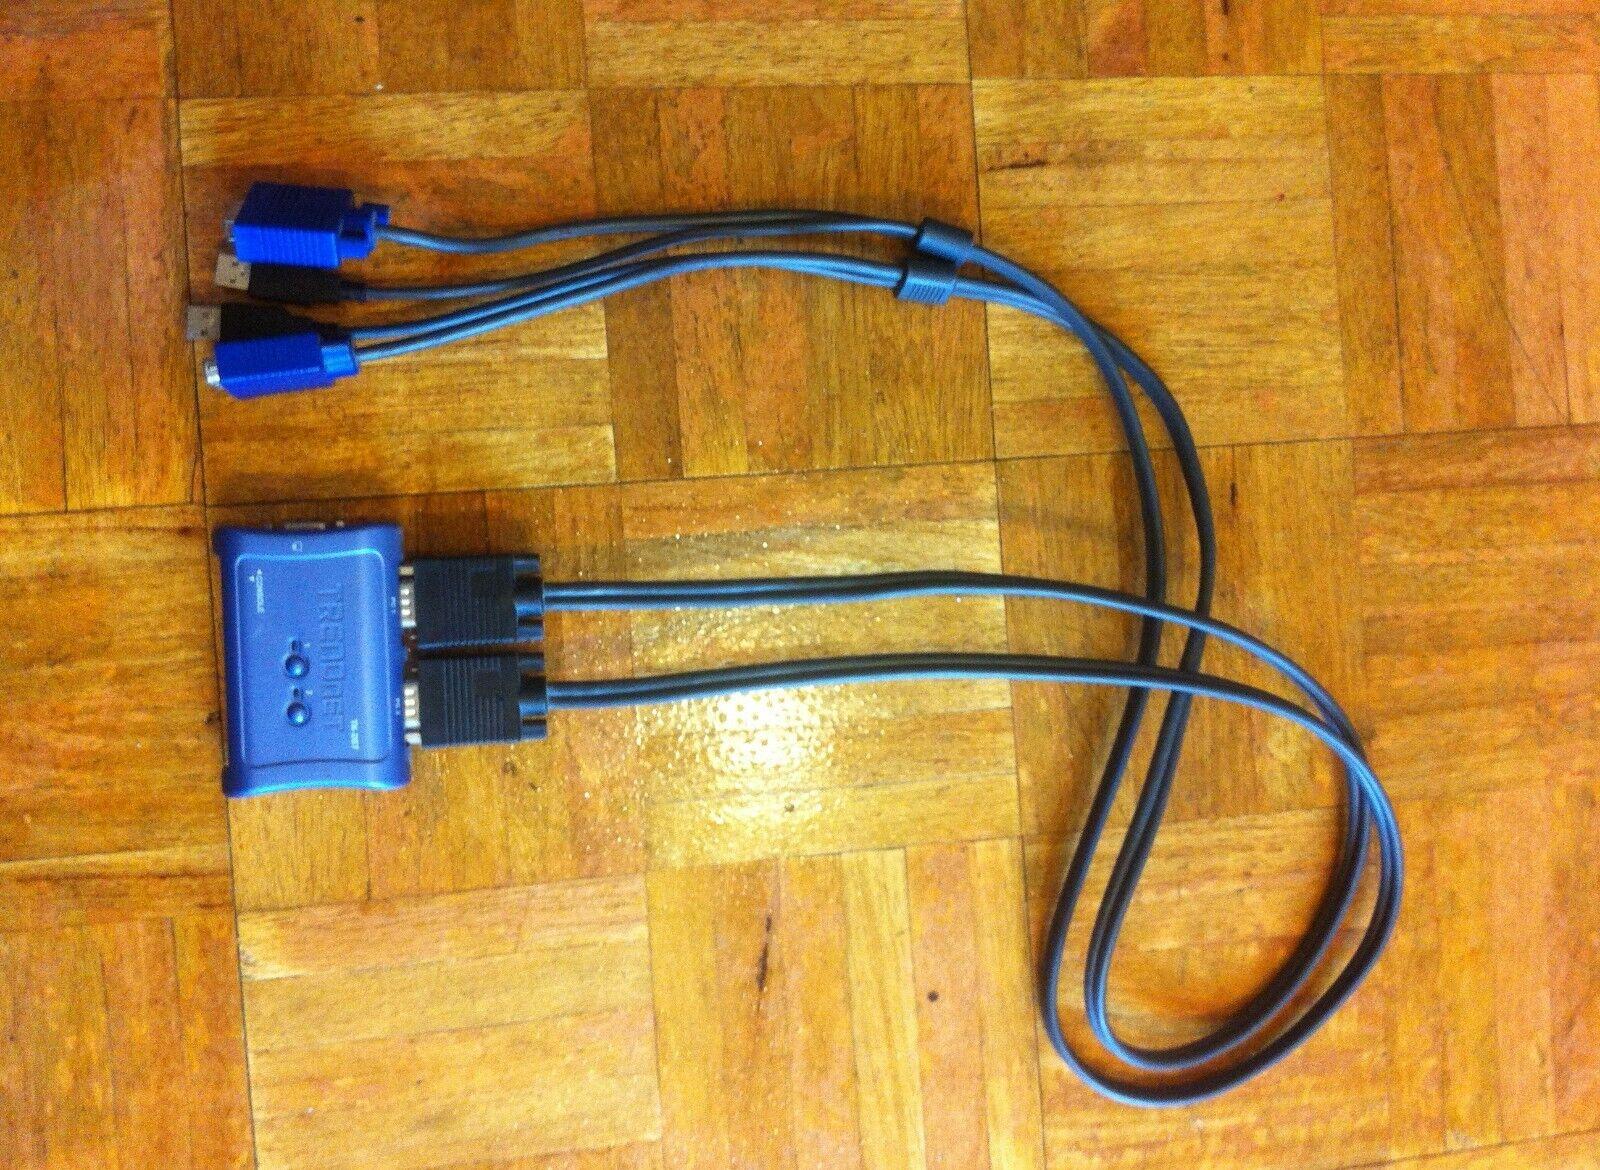 TRENDnet Tk207 2-port USB KVM Switch Cable Kit Used